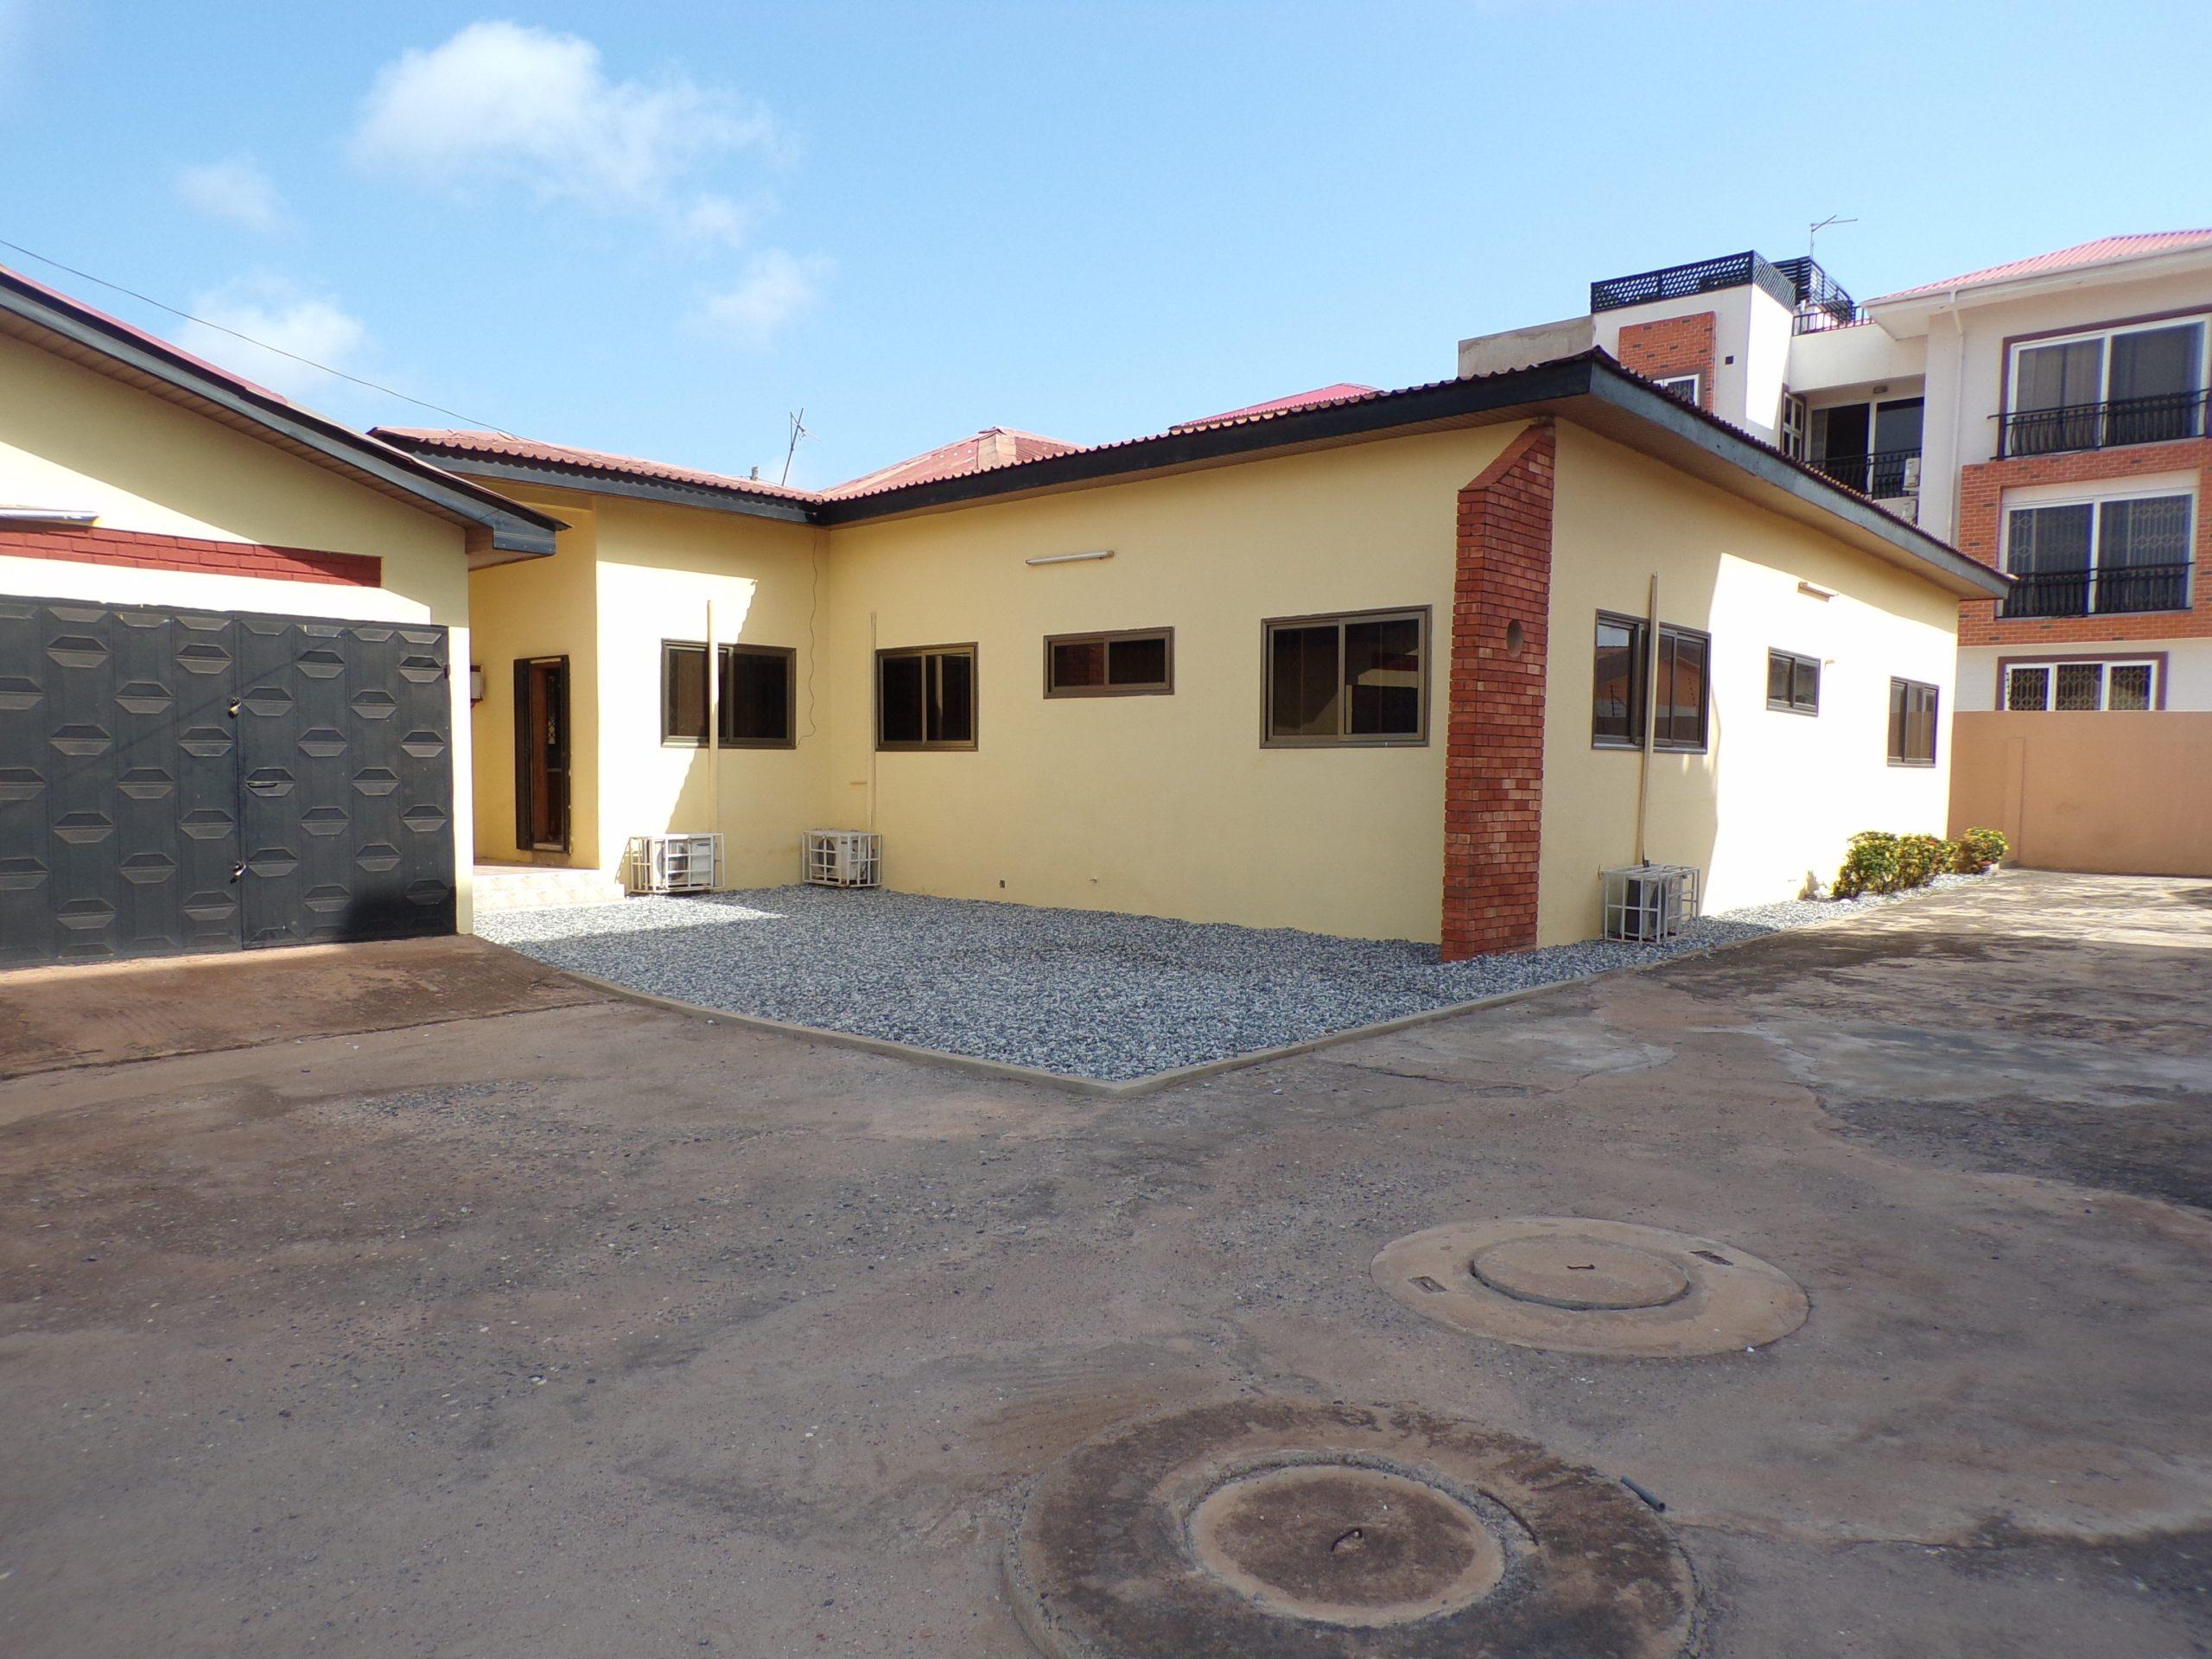 4 bedroom Unfurnished House for Rent in Adjiringanor